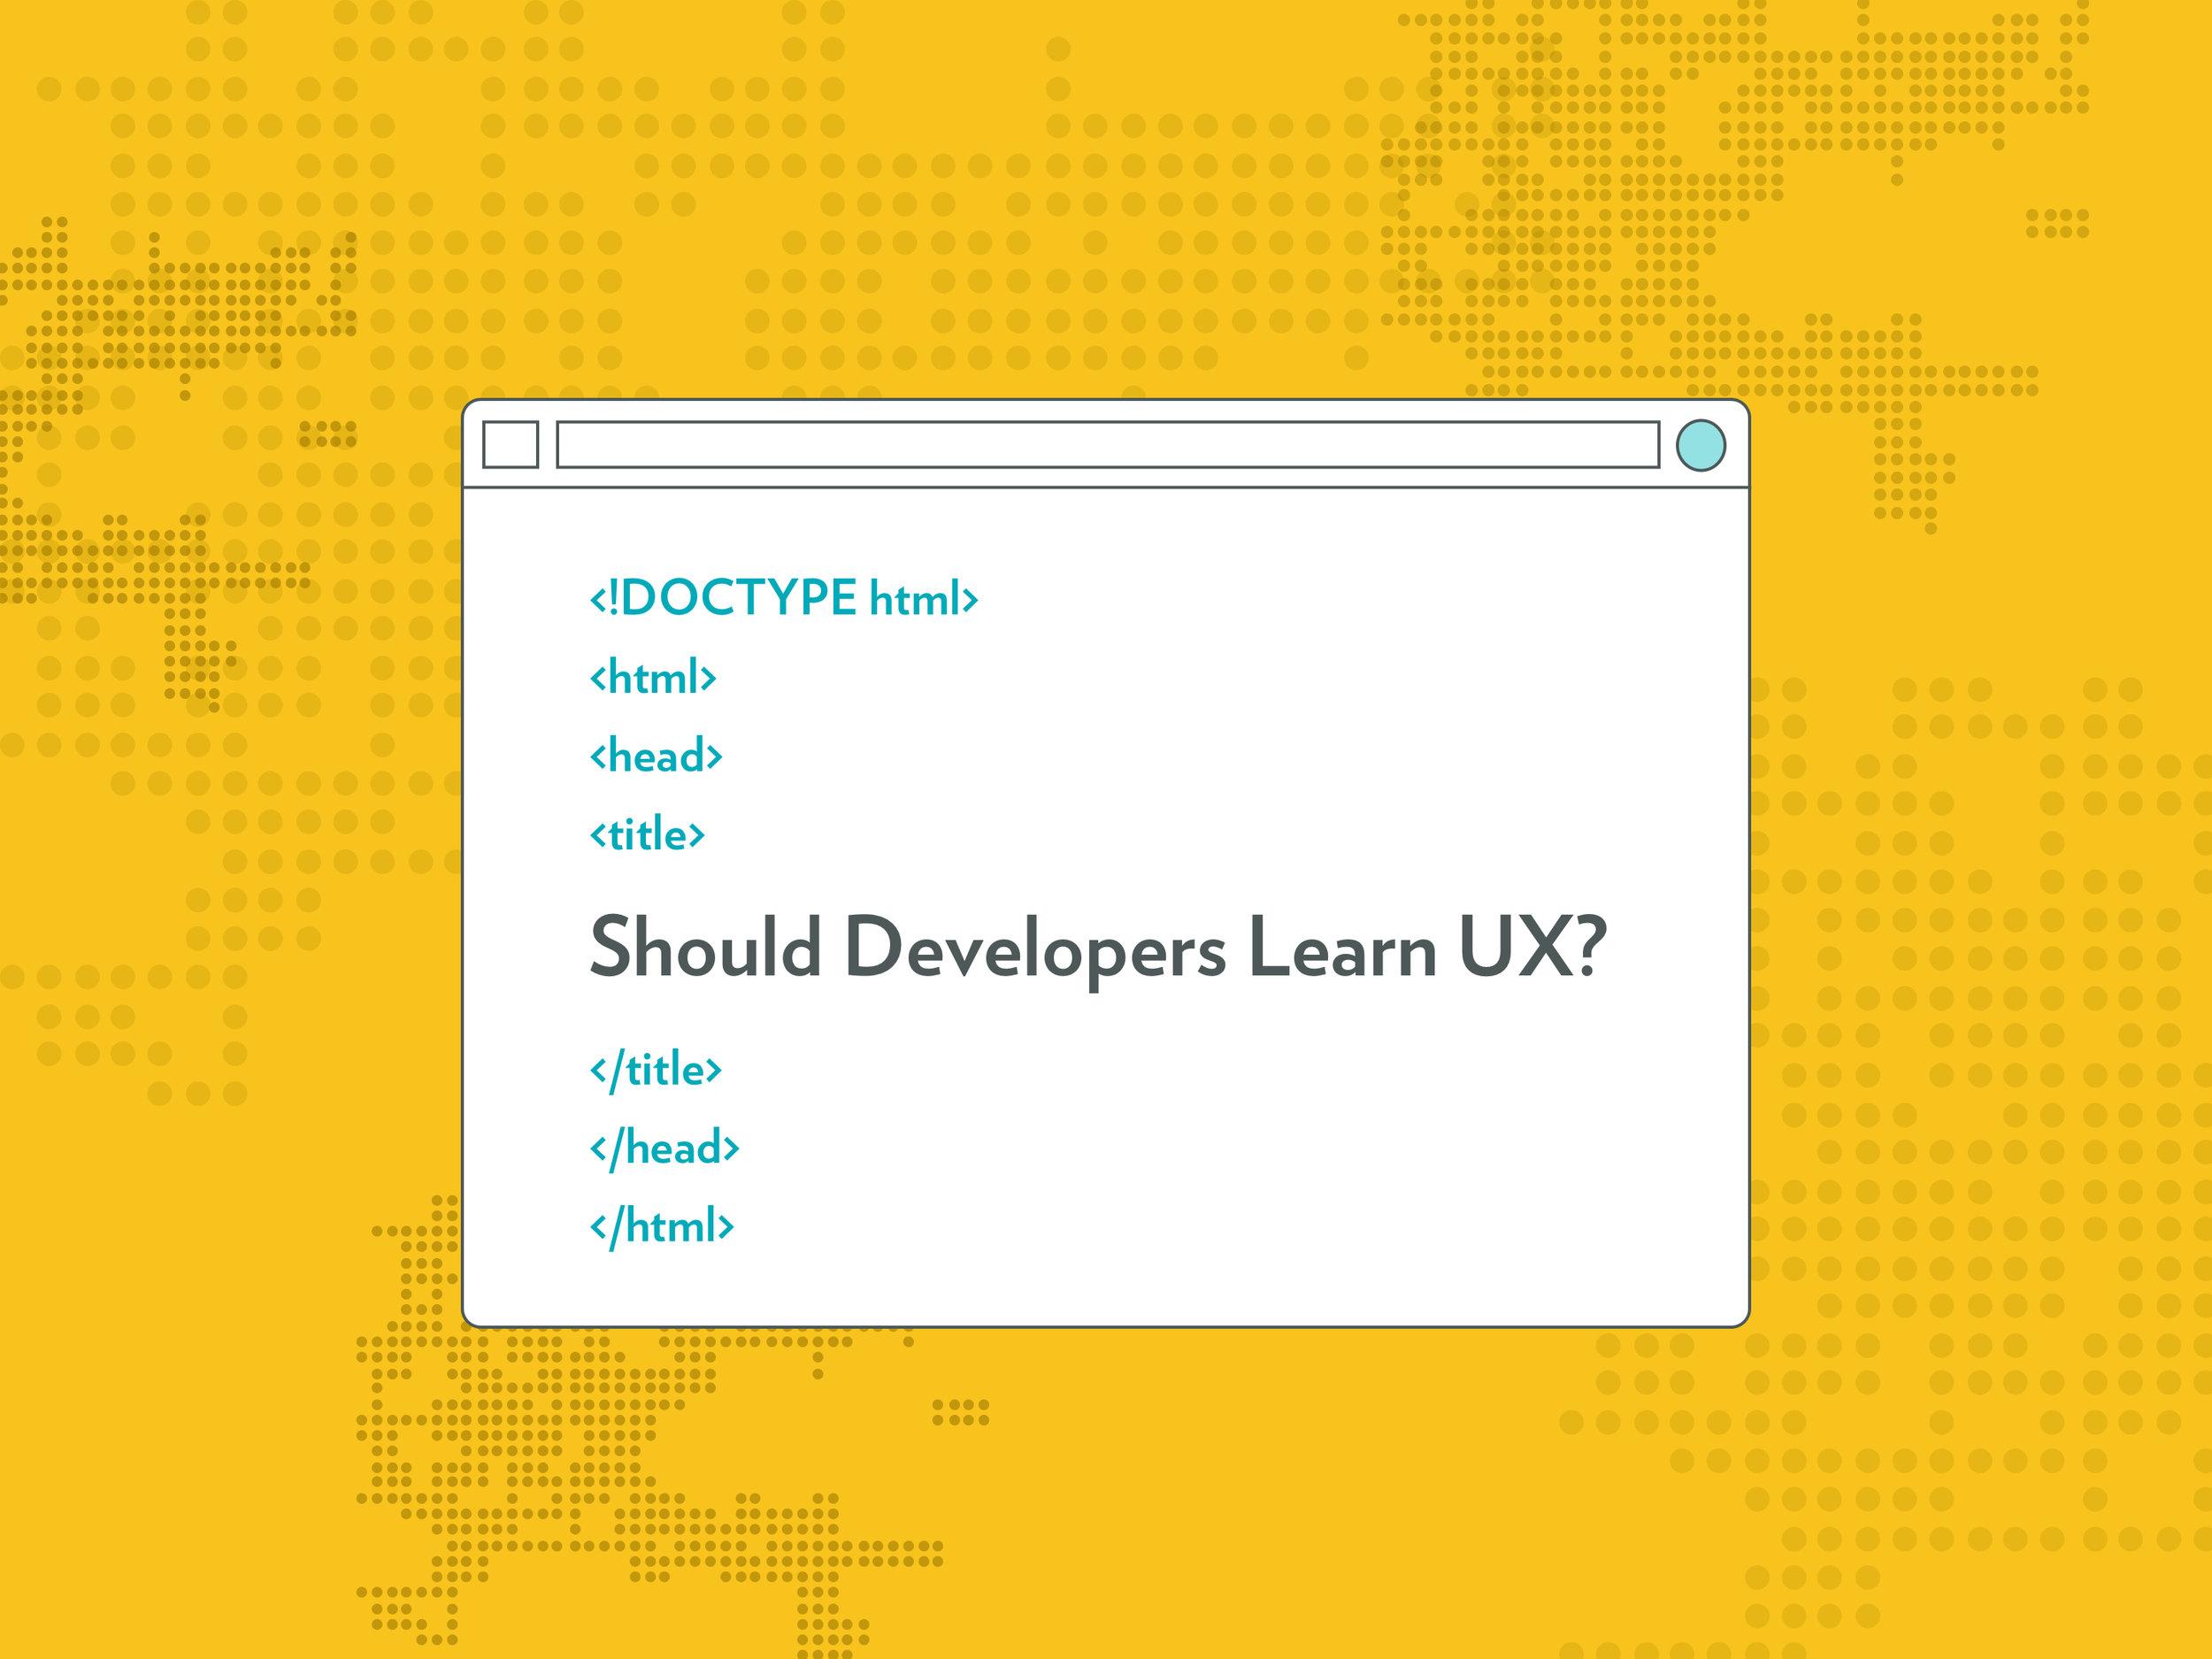 Should Developers Learn UX?